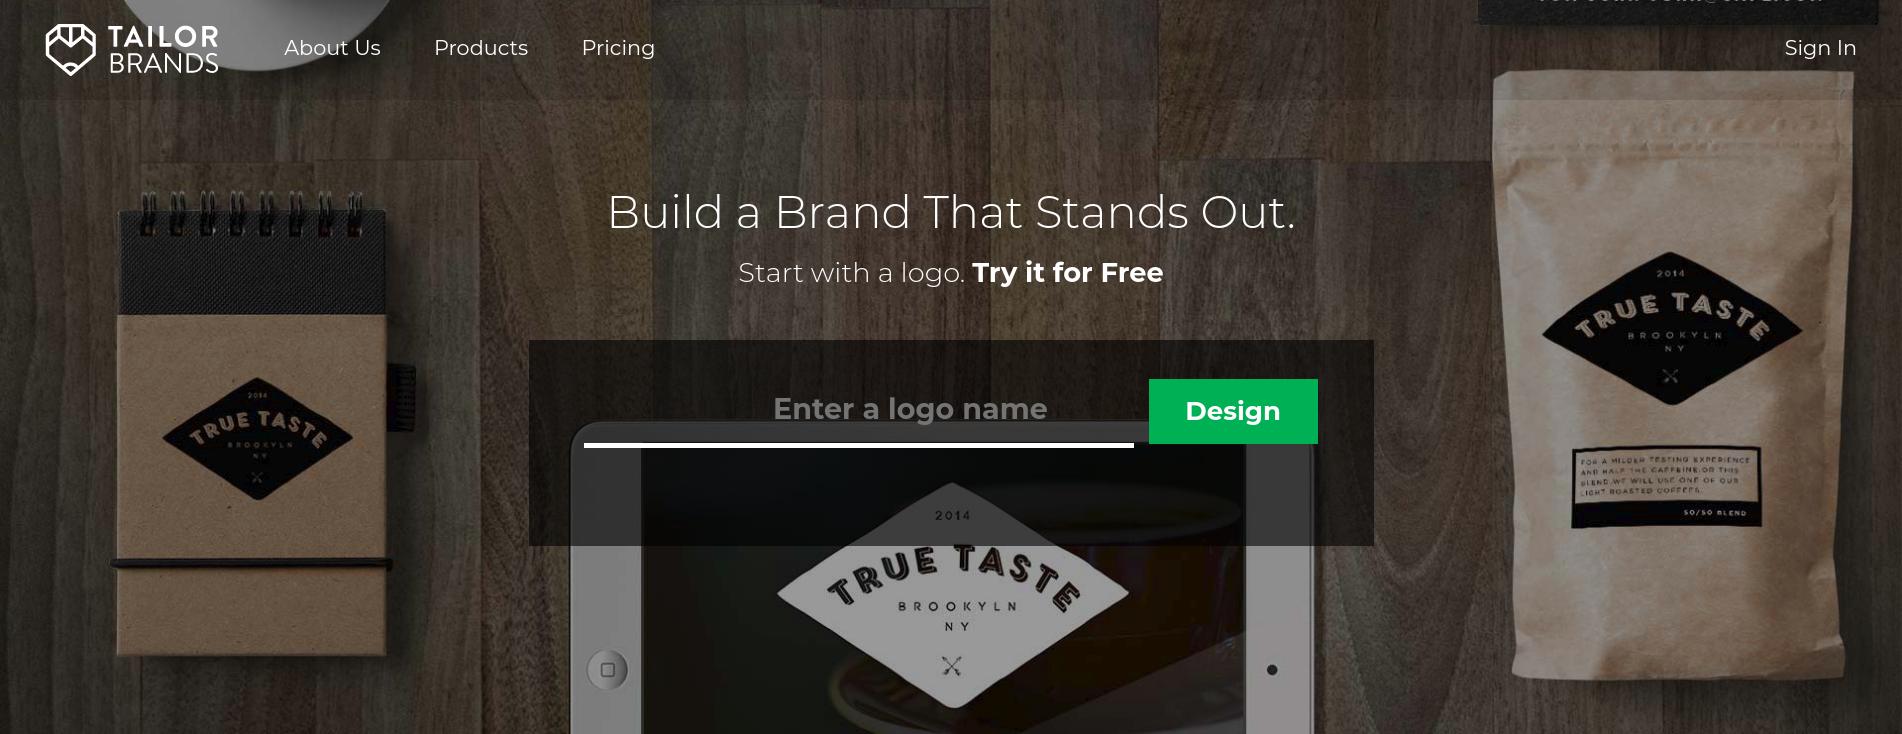 Tailor Brands Review - Design a Logo